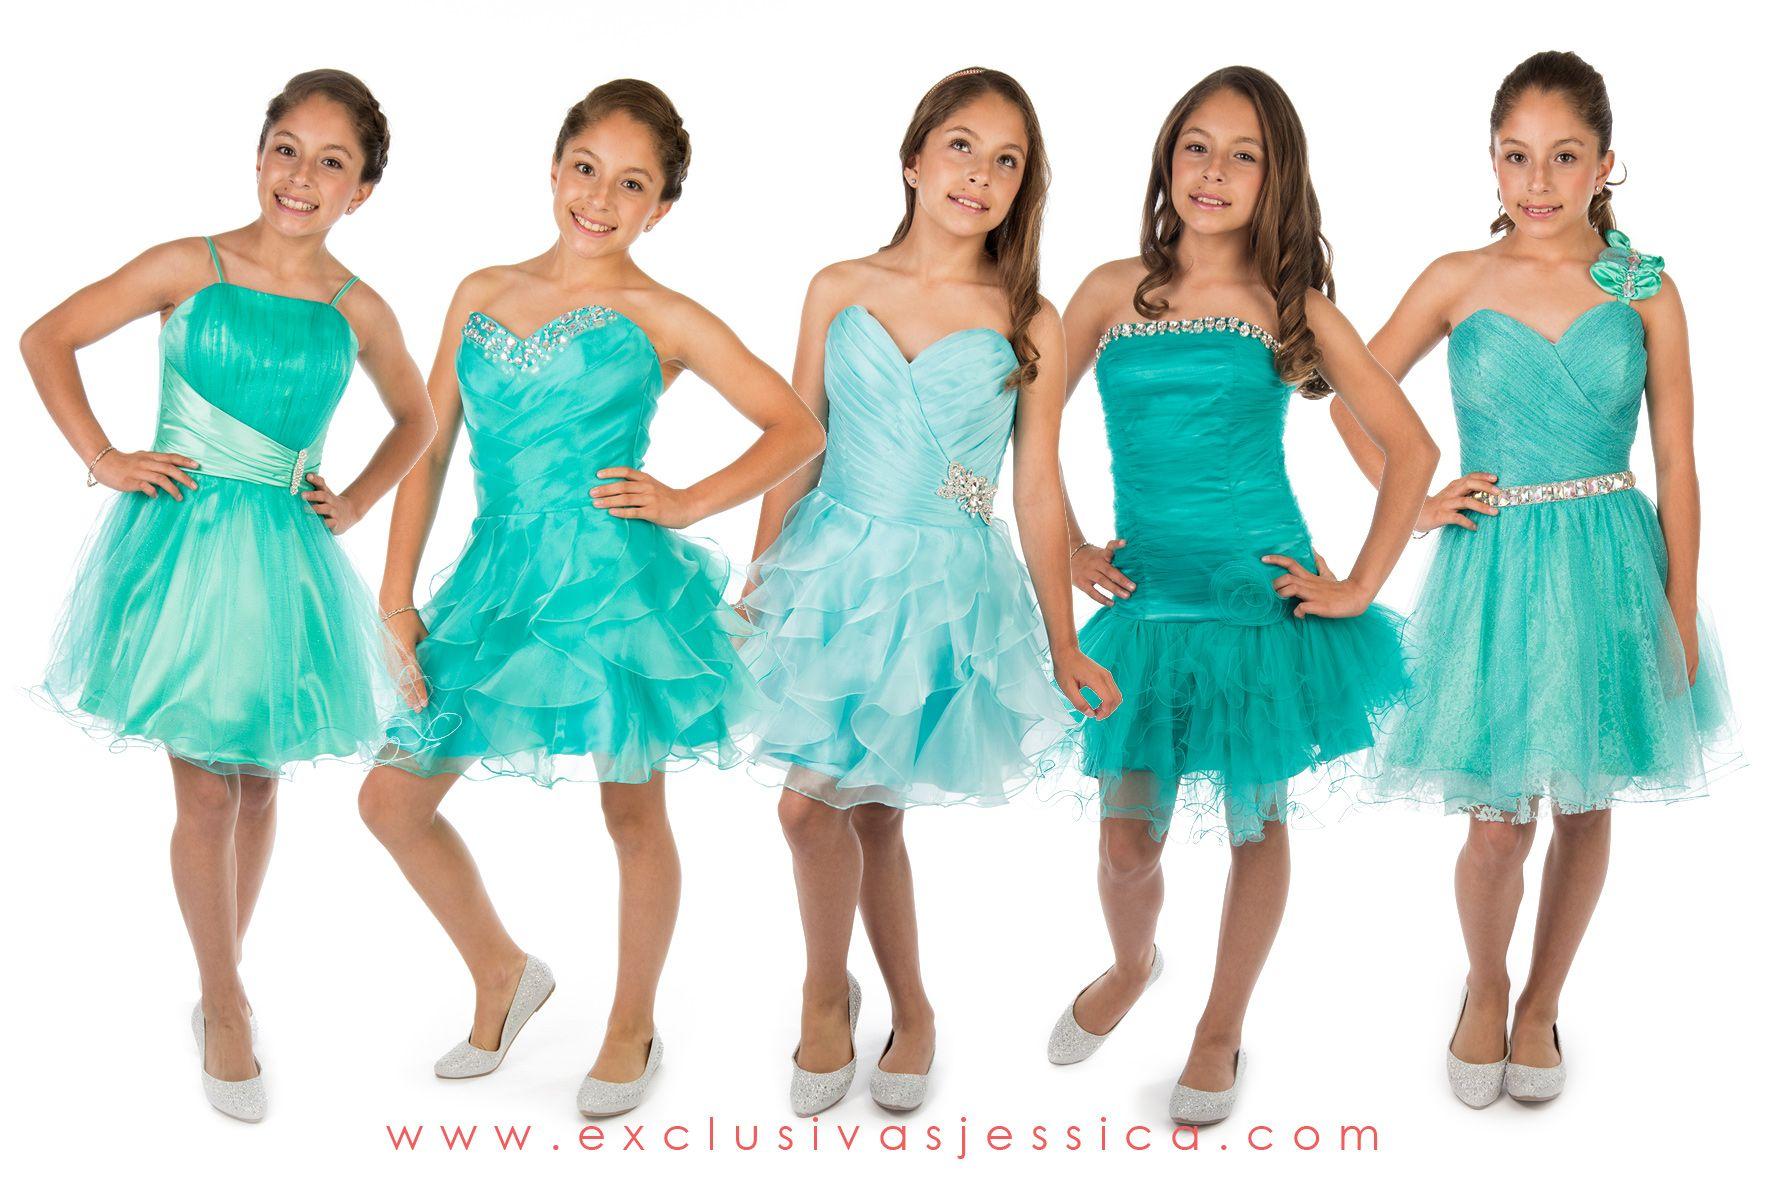 Jessica Vestidos Fiesta Gala Moda Drees Vestidos